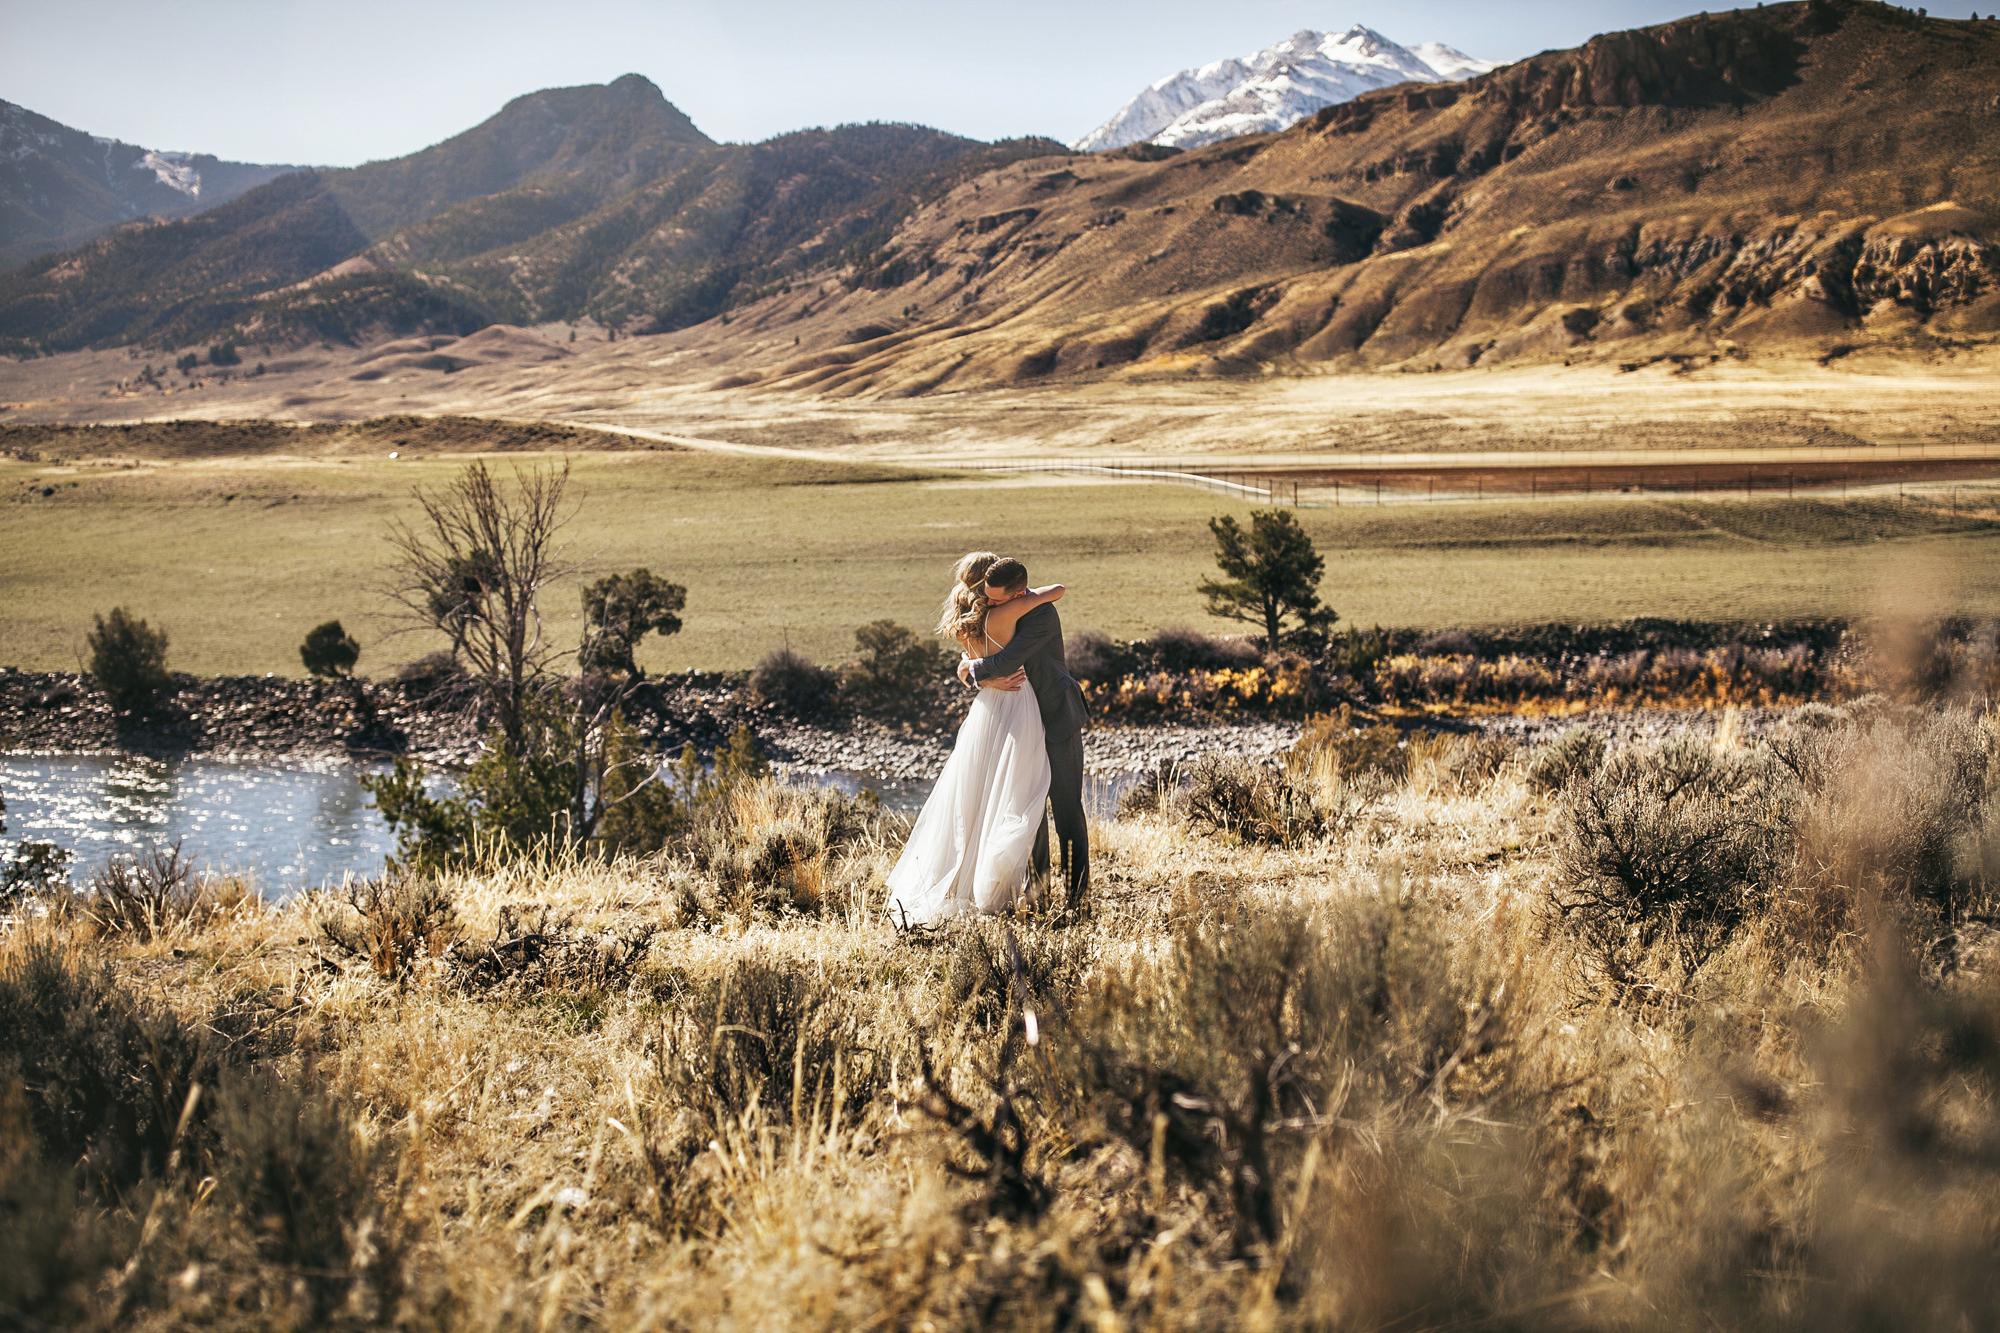 yellowstone national park wedding gardiner montana first look wedding photography brandon werth